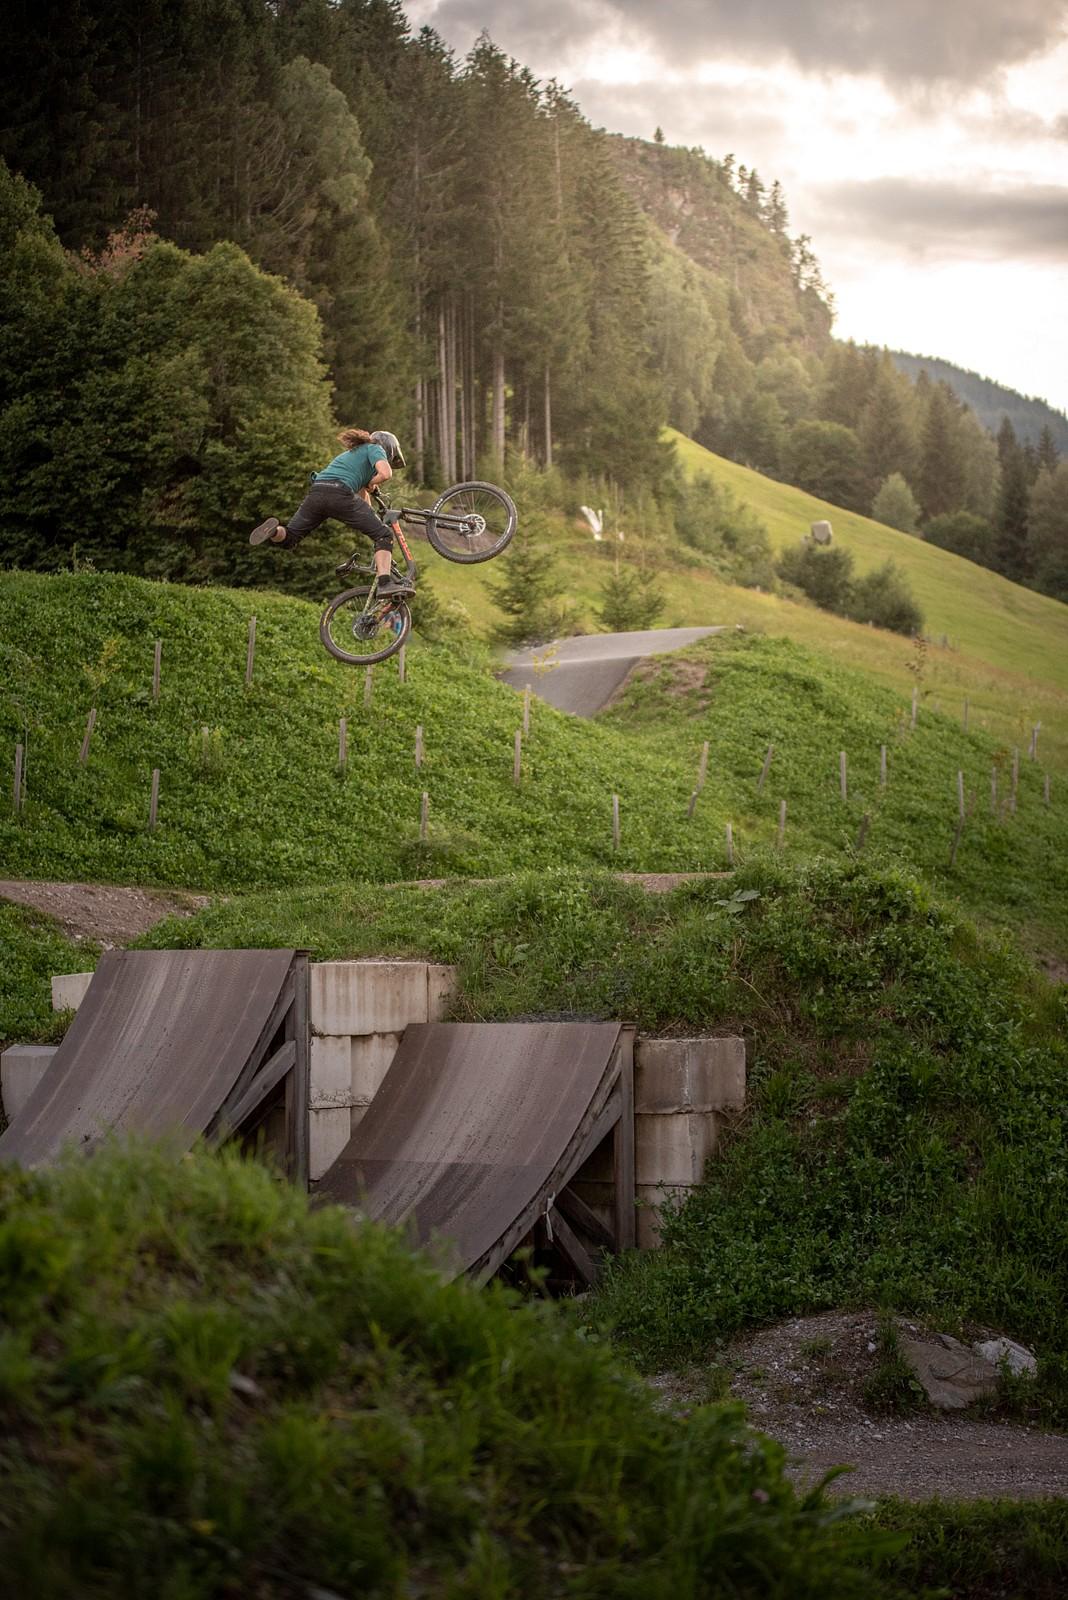 Karate  - JUZIO - Mountain Biking Pictures - Vital MTB